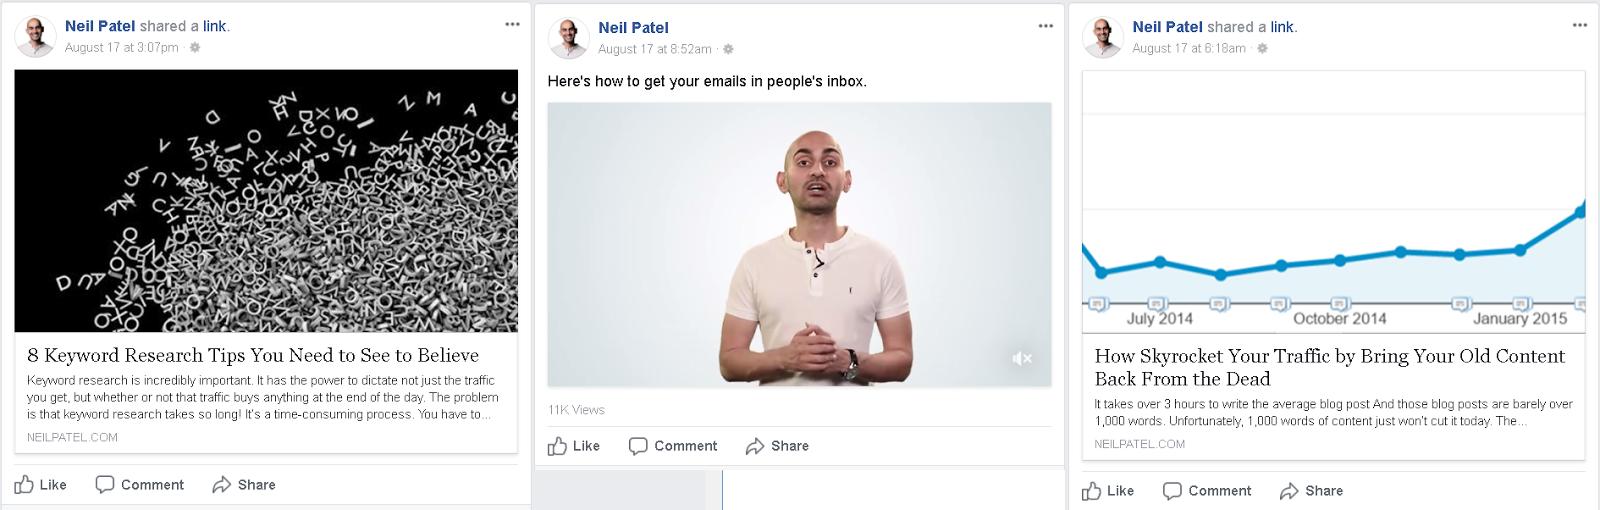 Neil Patel 83